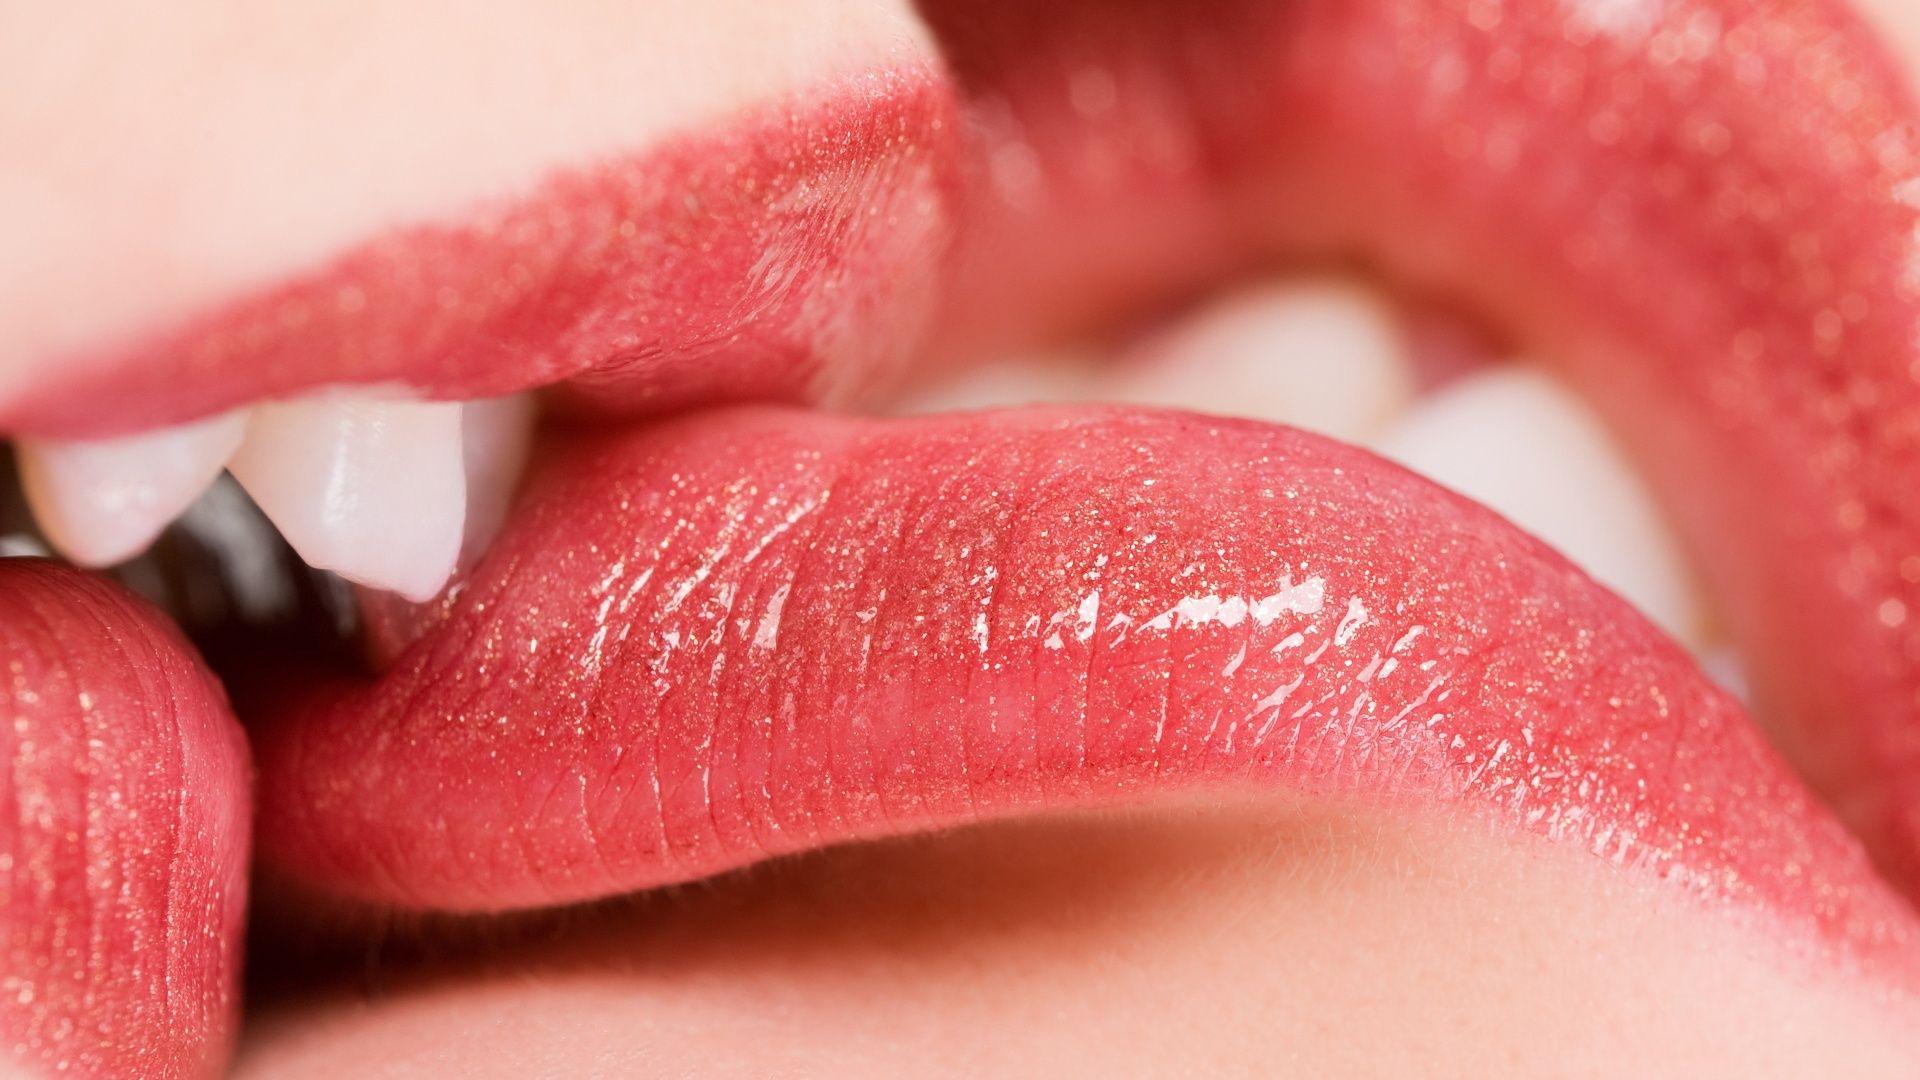 Sfondi mobili ~ Lip kiss wallpapers http: www.nicewallpapers.in wallpaper lip